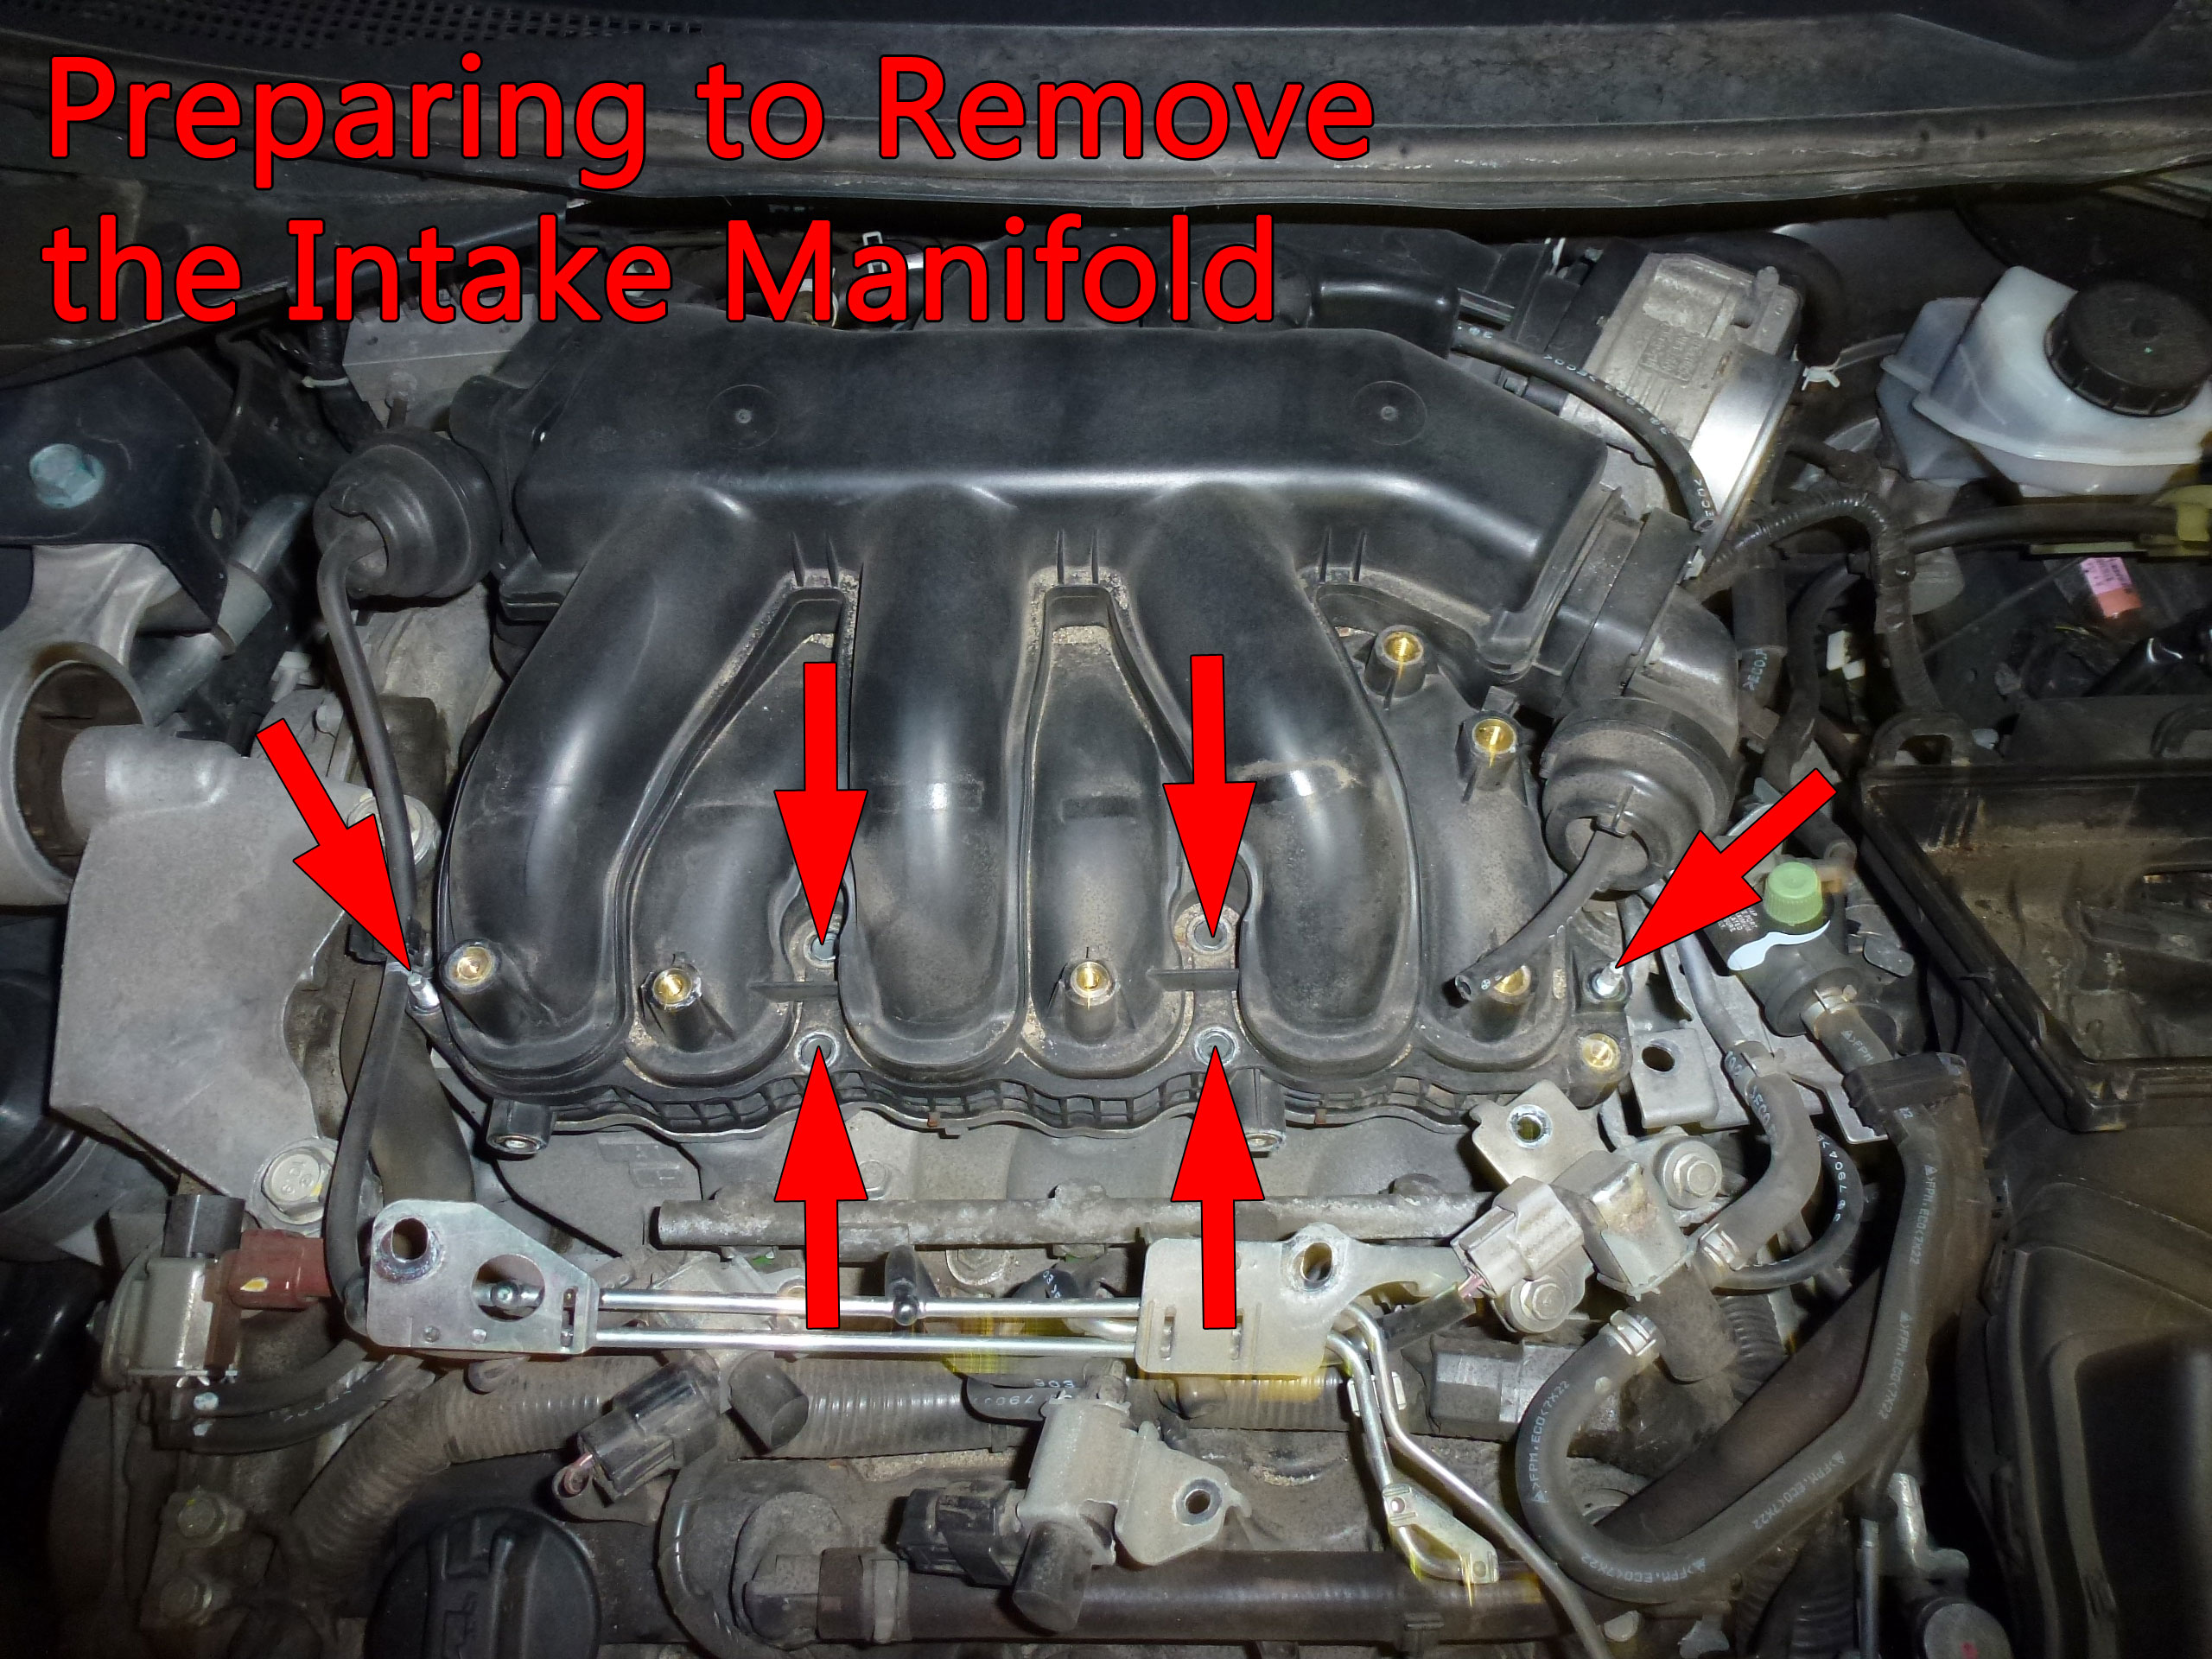 Nissan Altima Spark Plug Replacement (4th Gen)